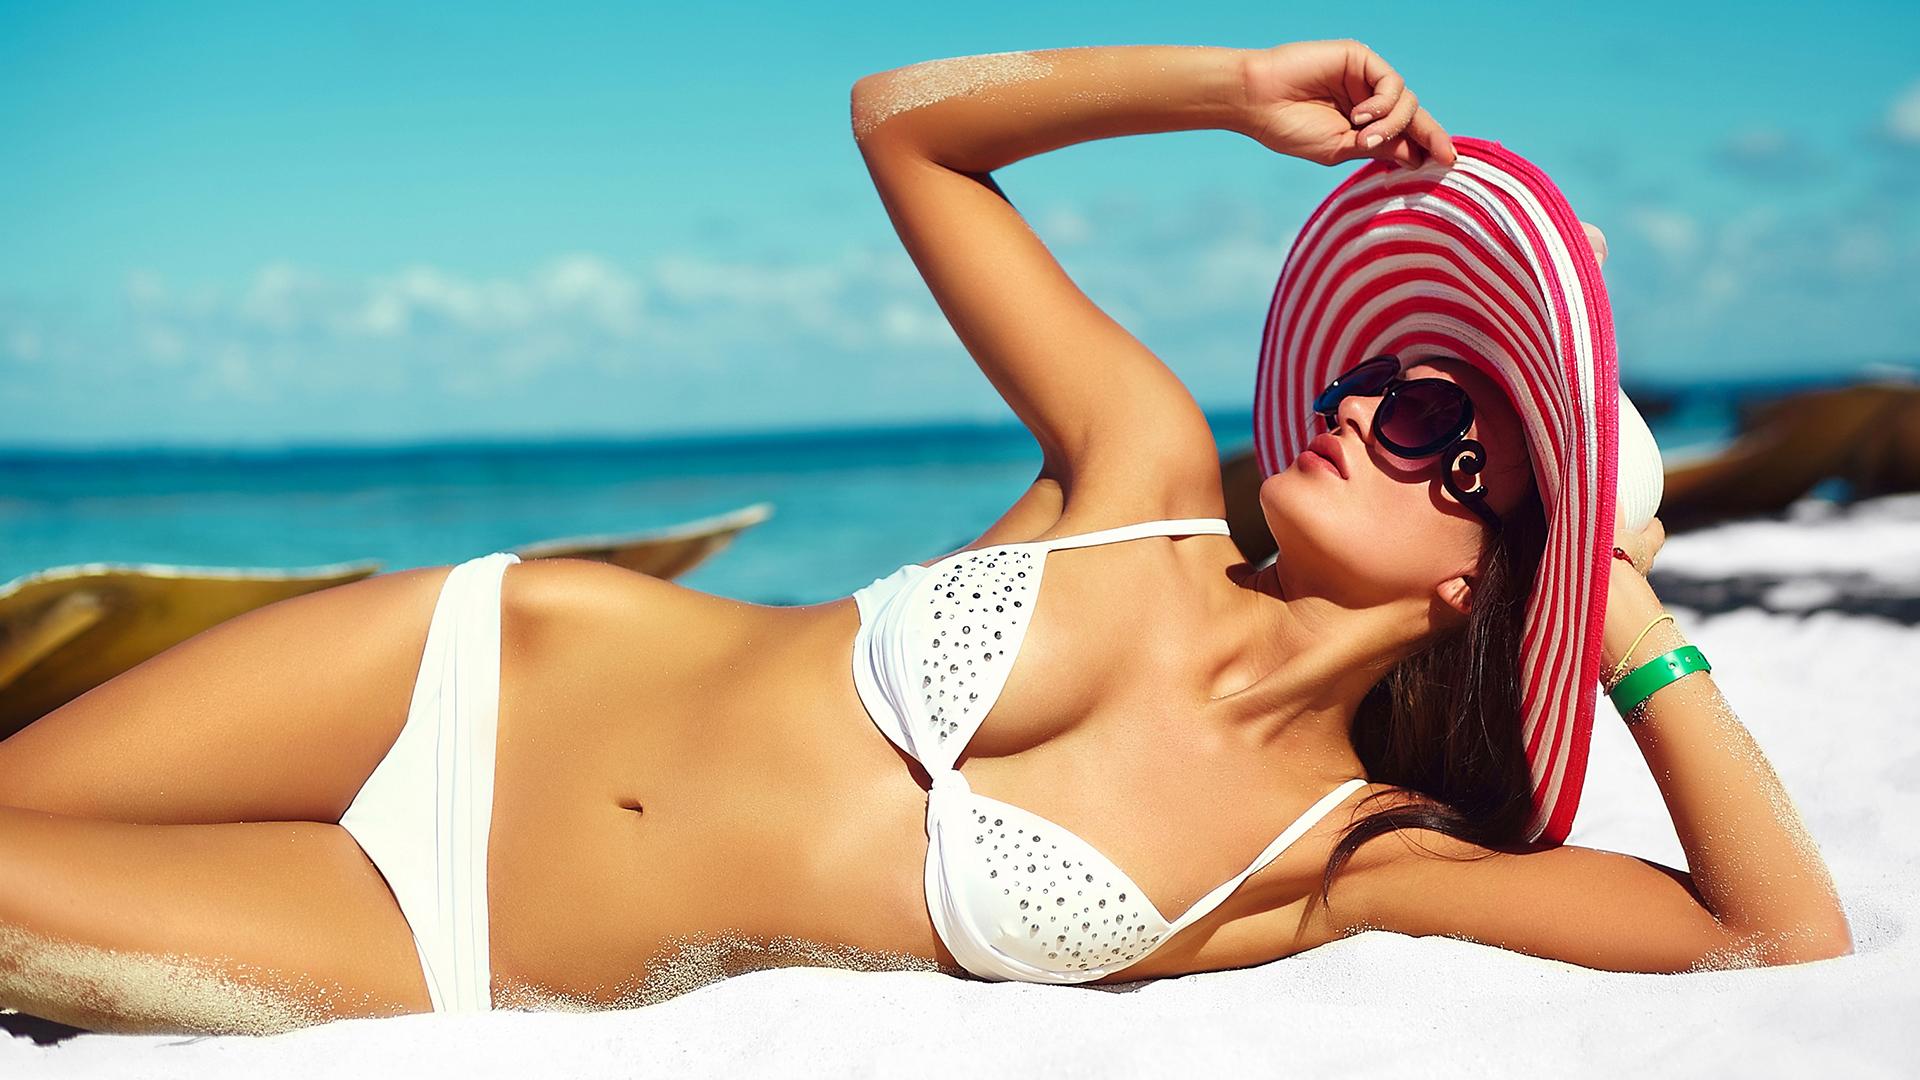 10 Tips To Get A Bikini Ready Body